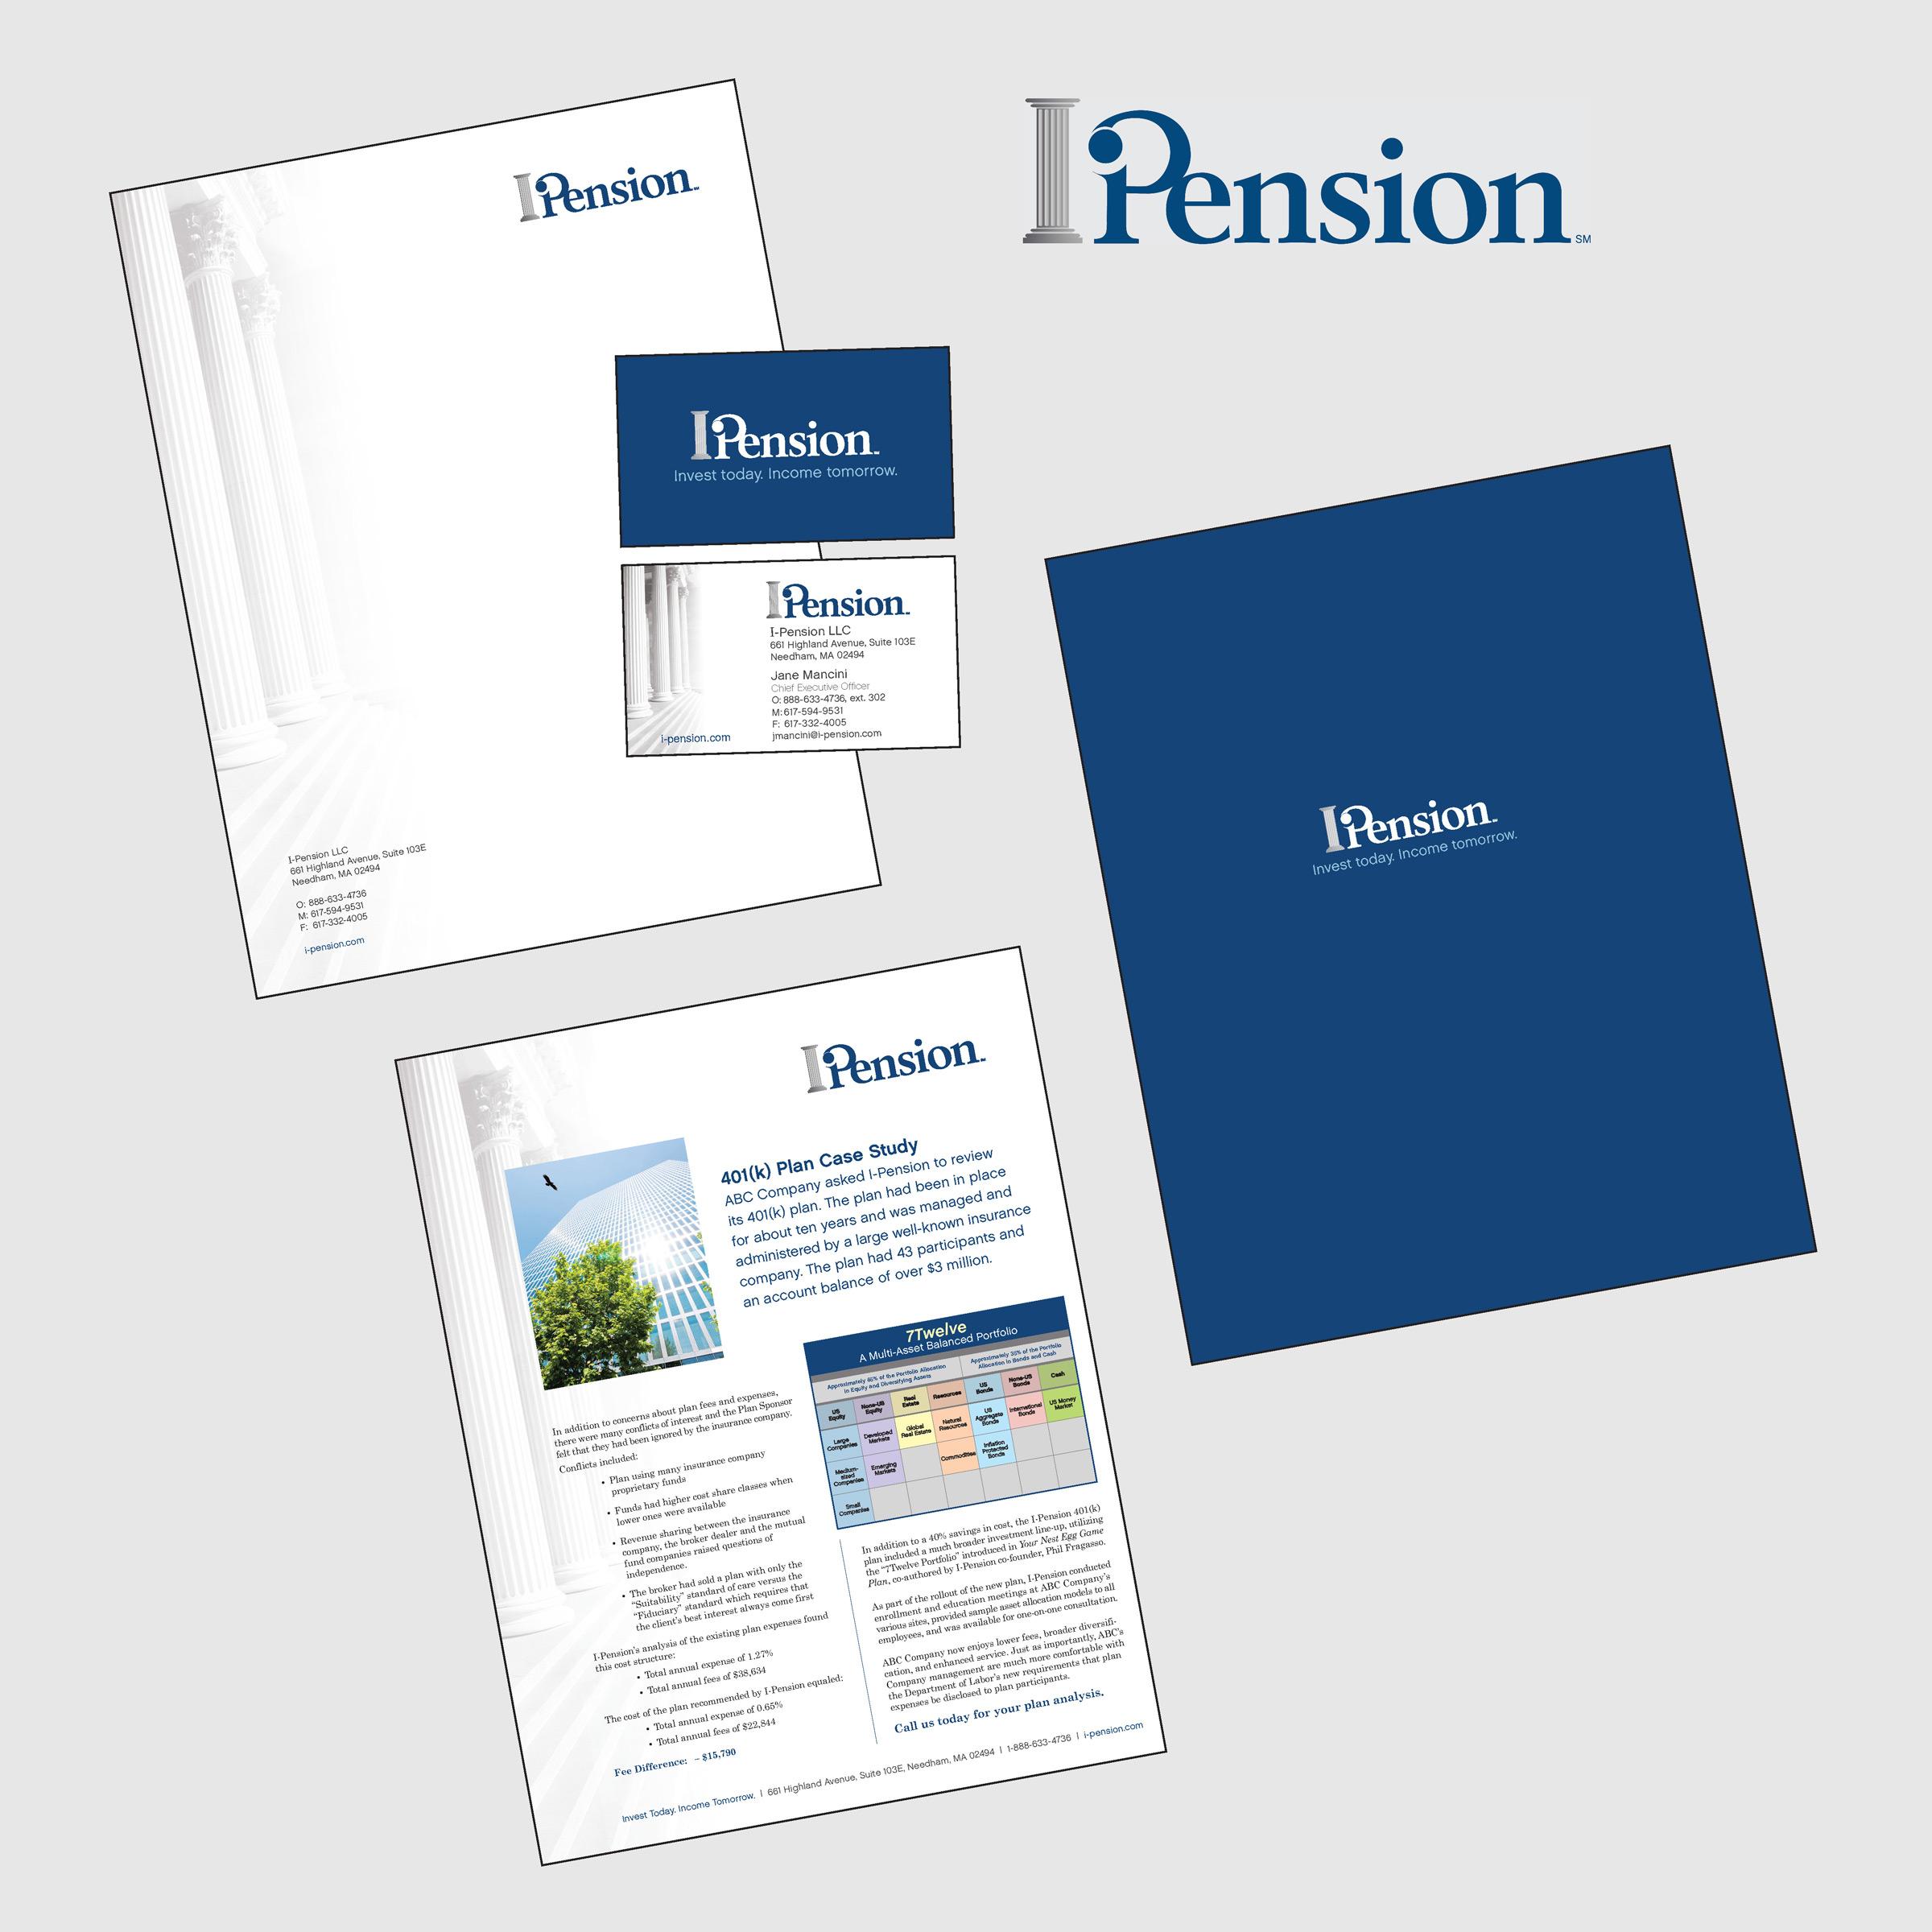 iPension-identity